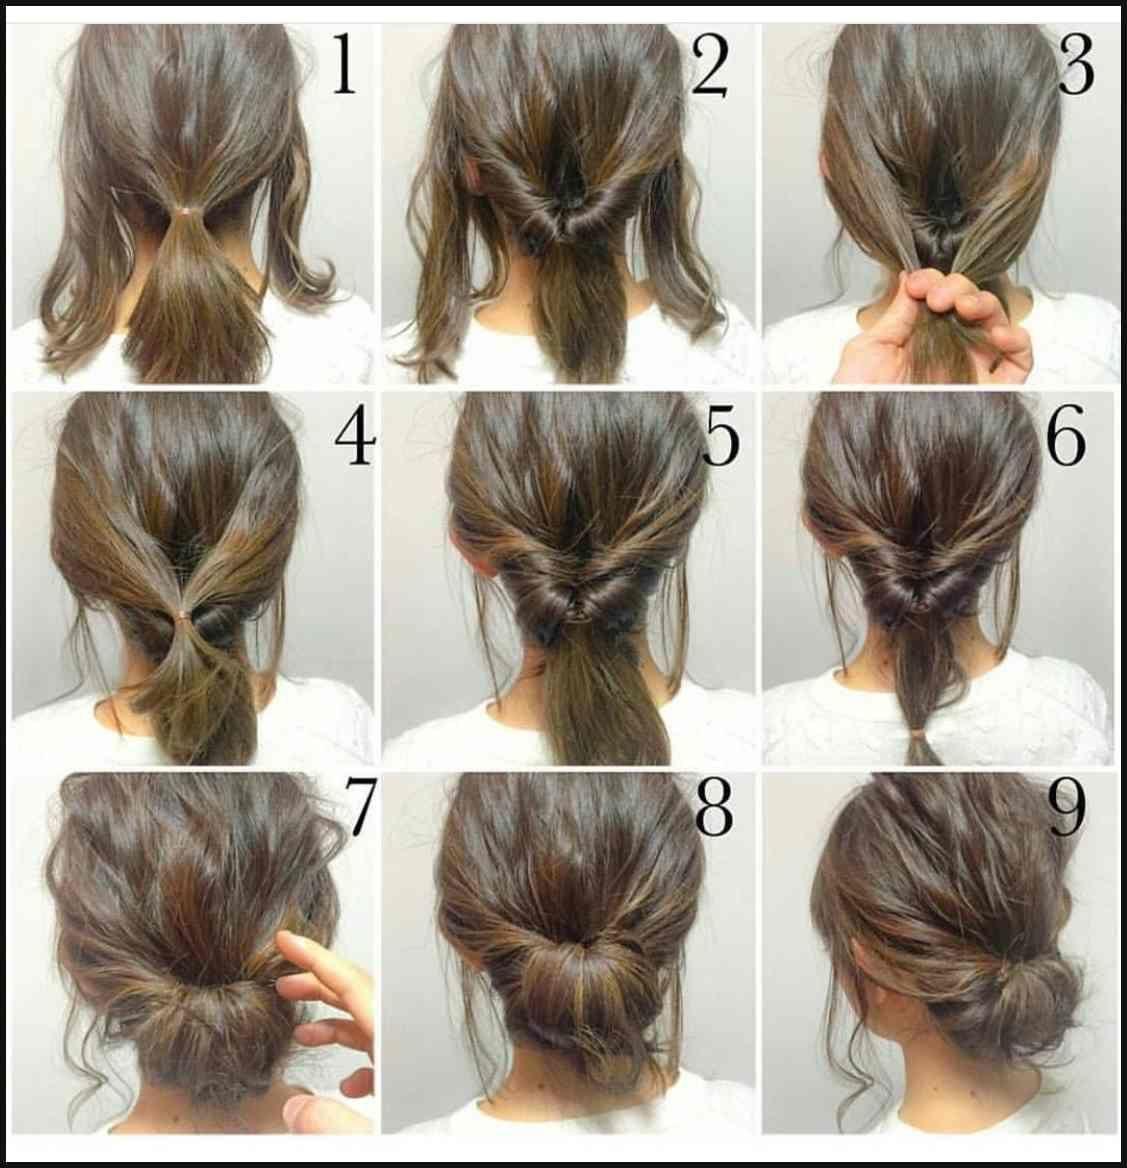 Messy Low Bun Frisuren Fur Damen Einfache Frisuren Frisuren Damen Haare Hair Styles Short Hair Styles Long Hair Styles